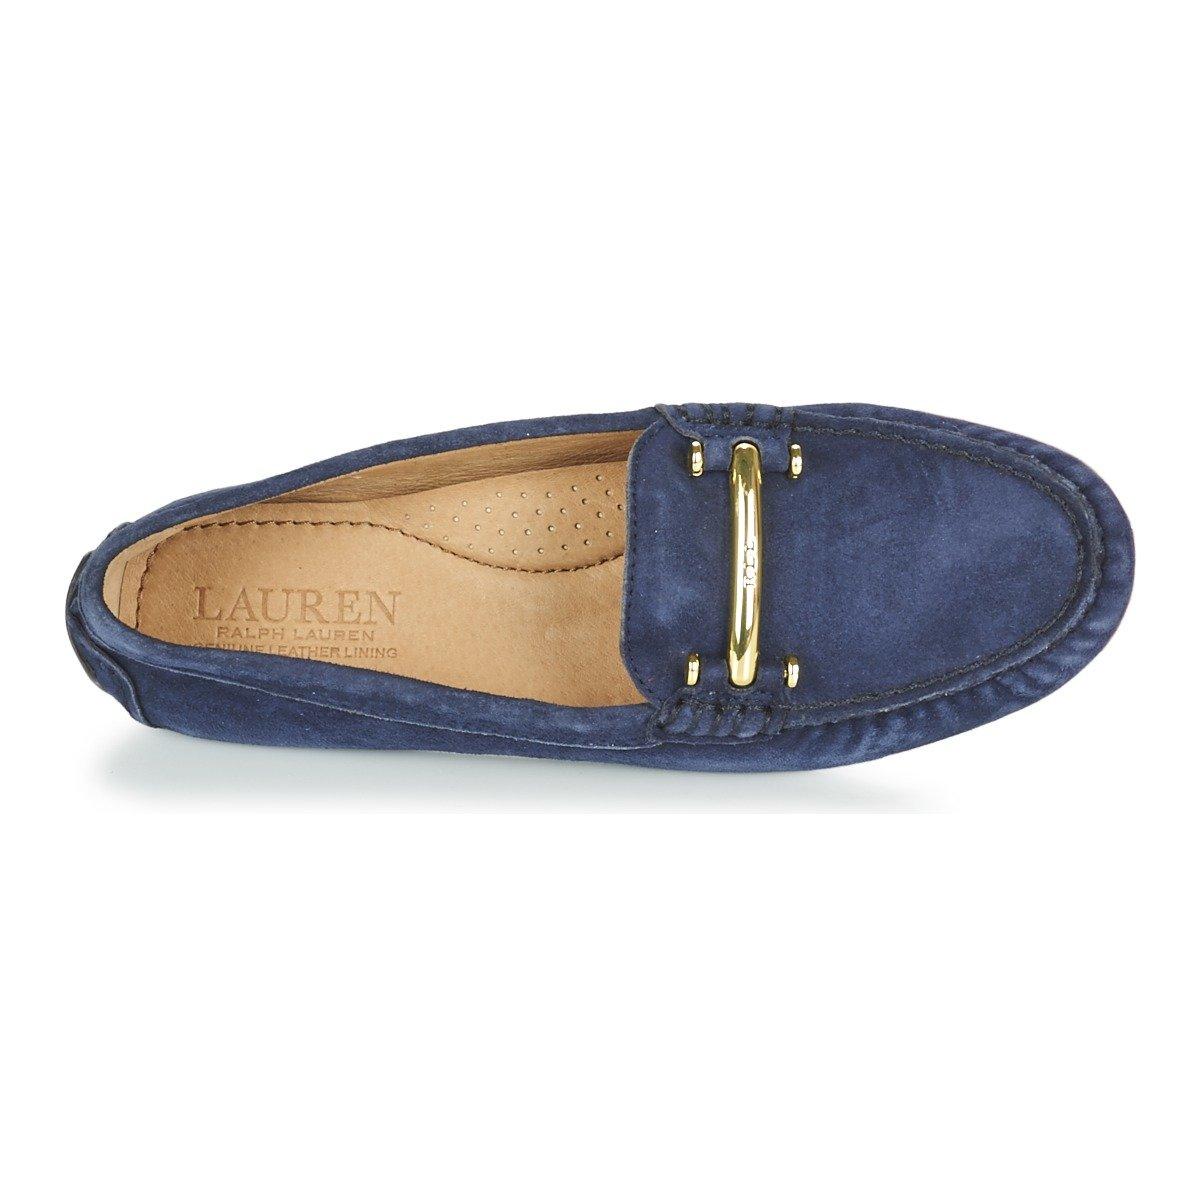 RALPH LAUREN Schuhe Schuhe LAUREN Flacher Caliana 802547700003 ee10ed